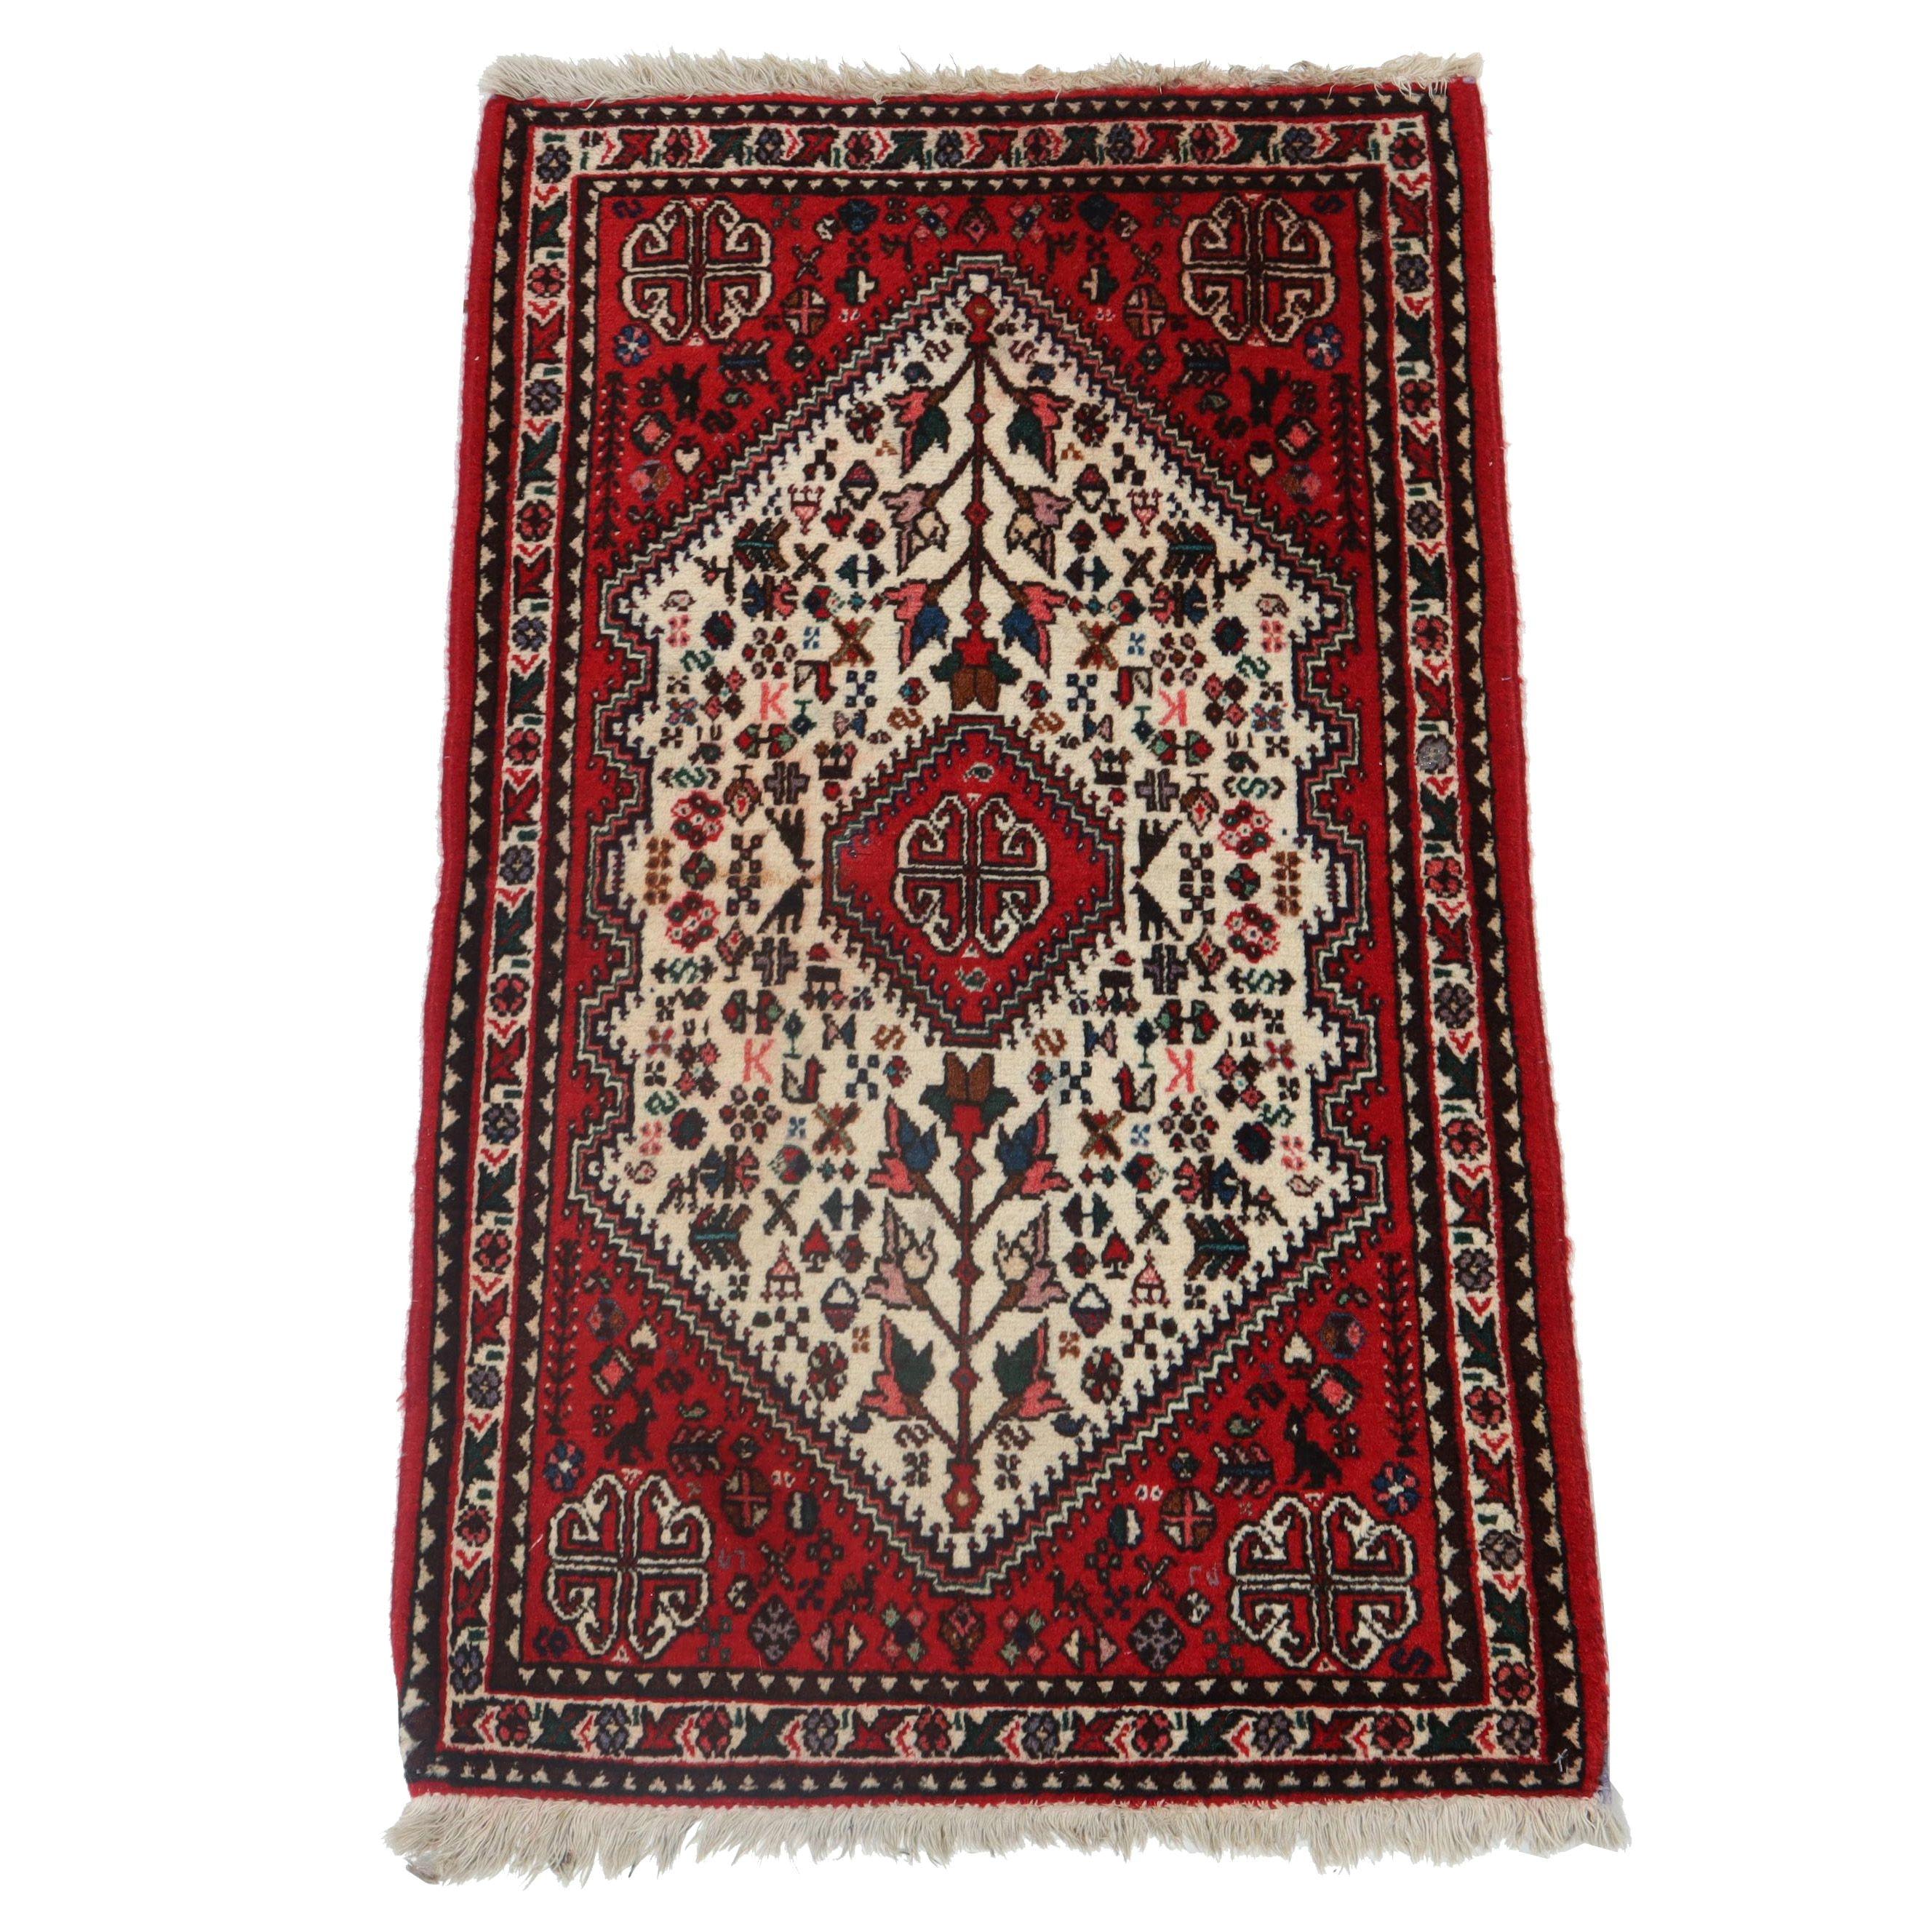 1.10' x 3.4' Hand-Knotted Persian Abadeh Shiraz Wool Rug, Circa 1970s